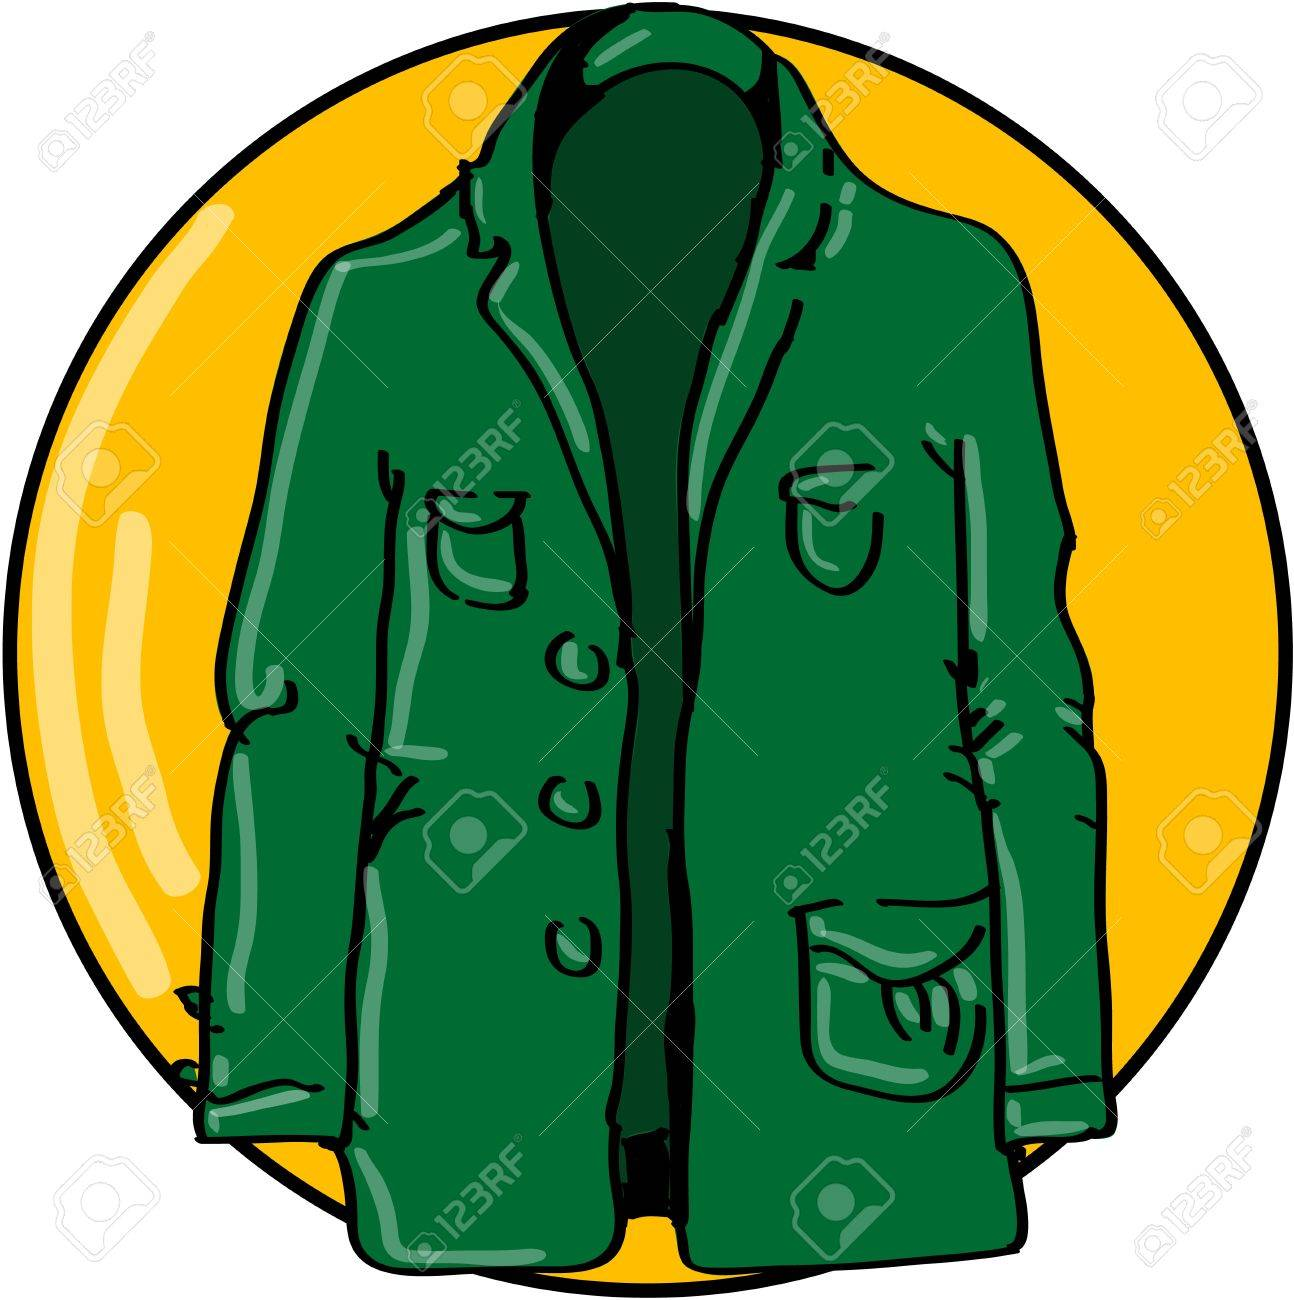 Green jacket on yellow circle Stock Vector - 18732163